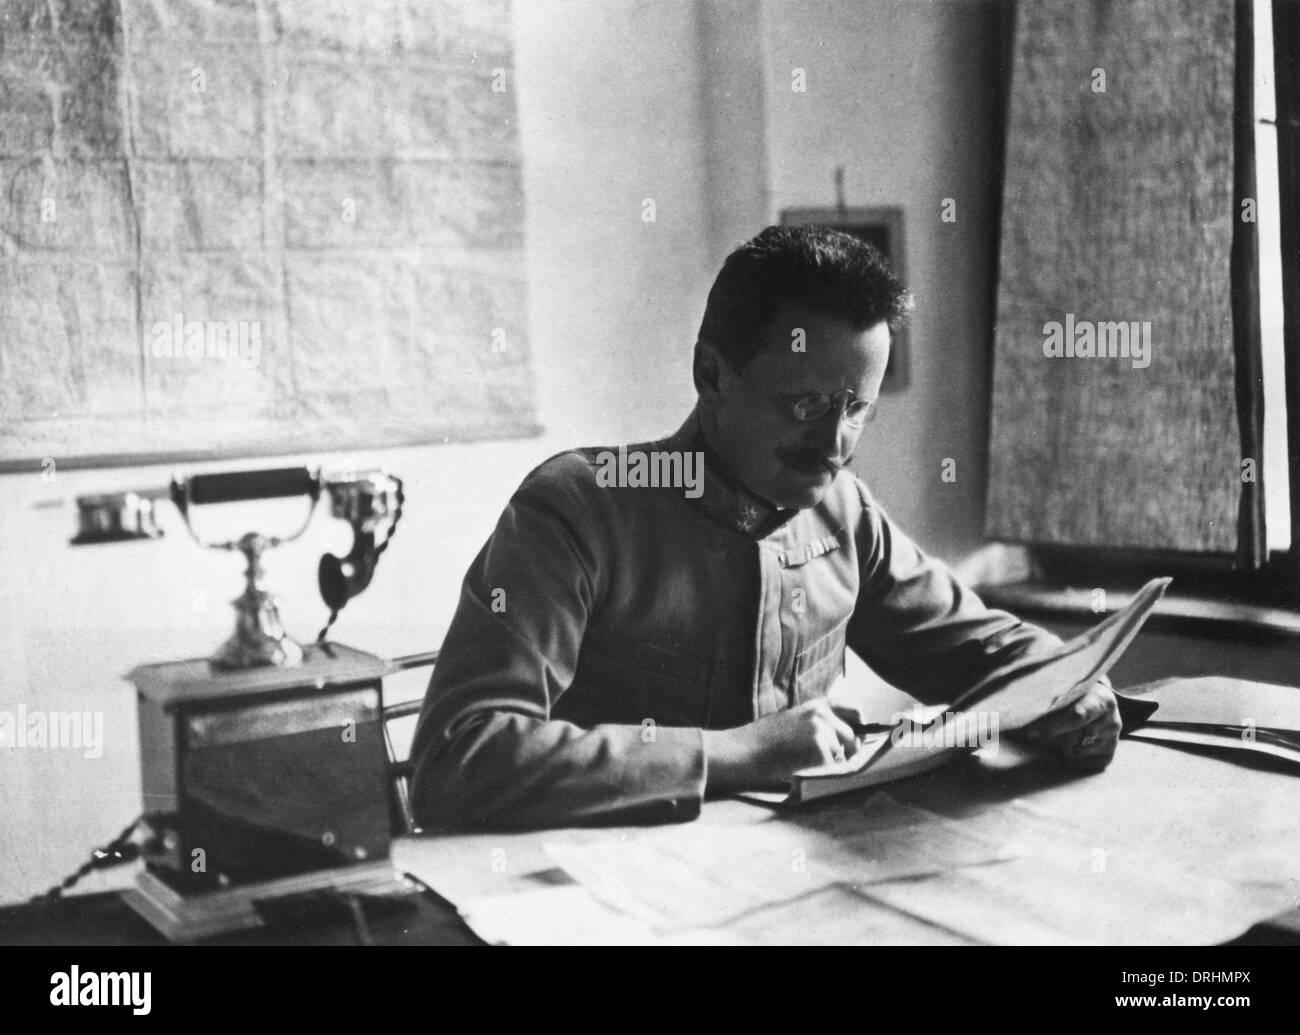 Oberleutnant Steurer, German army Chief of Staff, WW1 - Stock Image